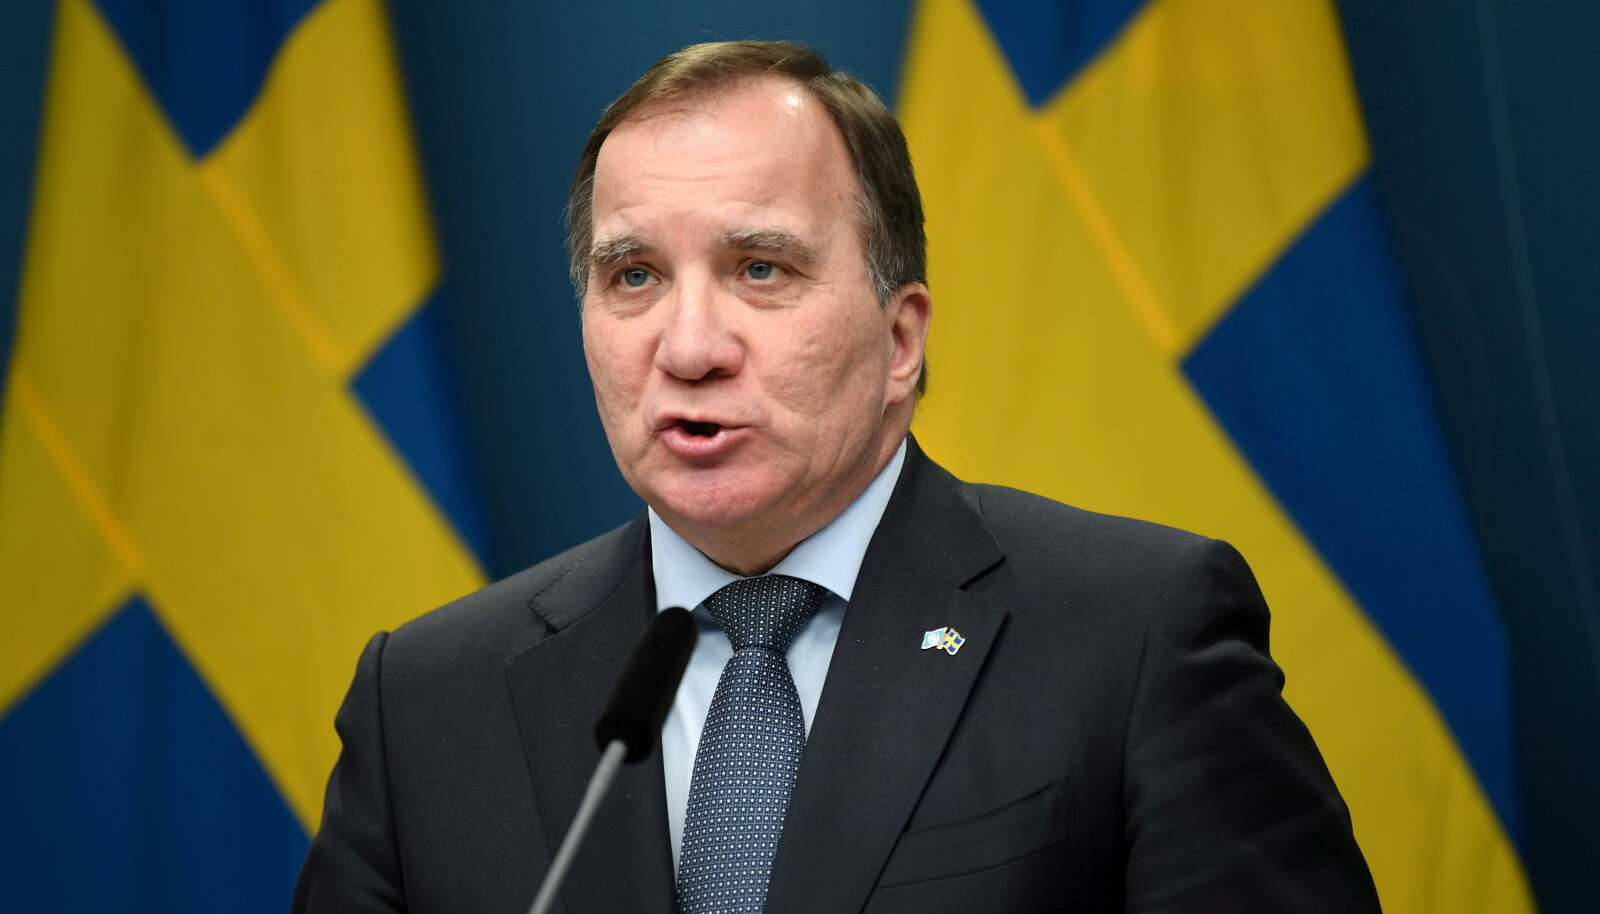 Peaminister Stefan Löfven